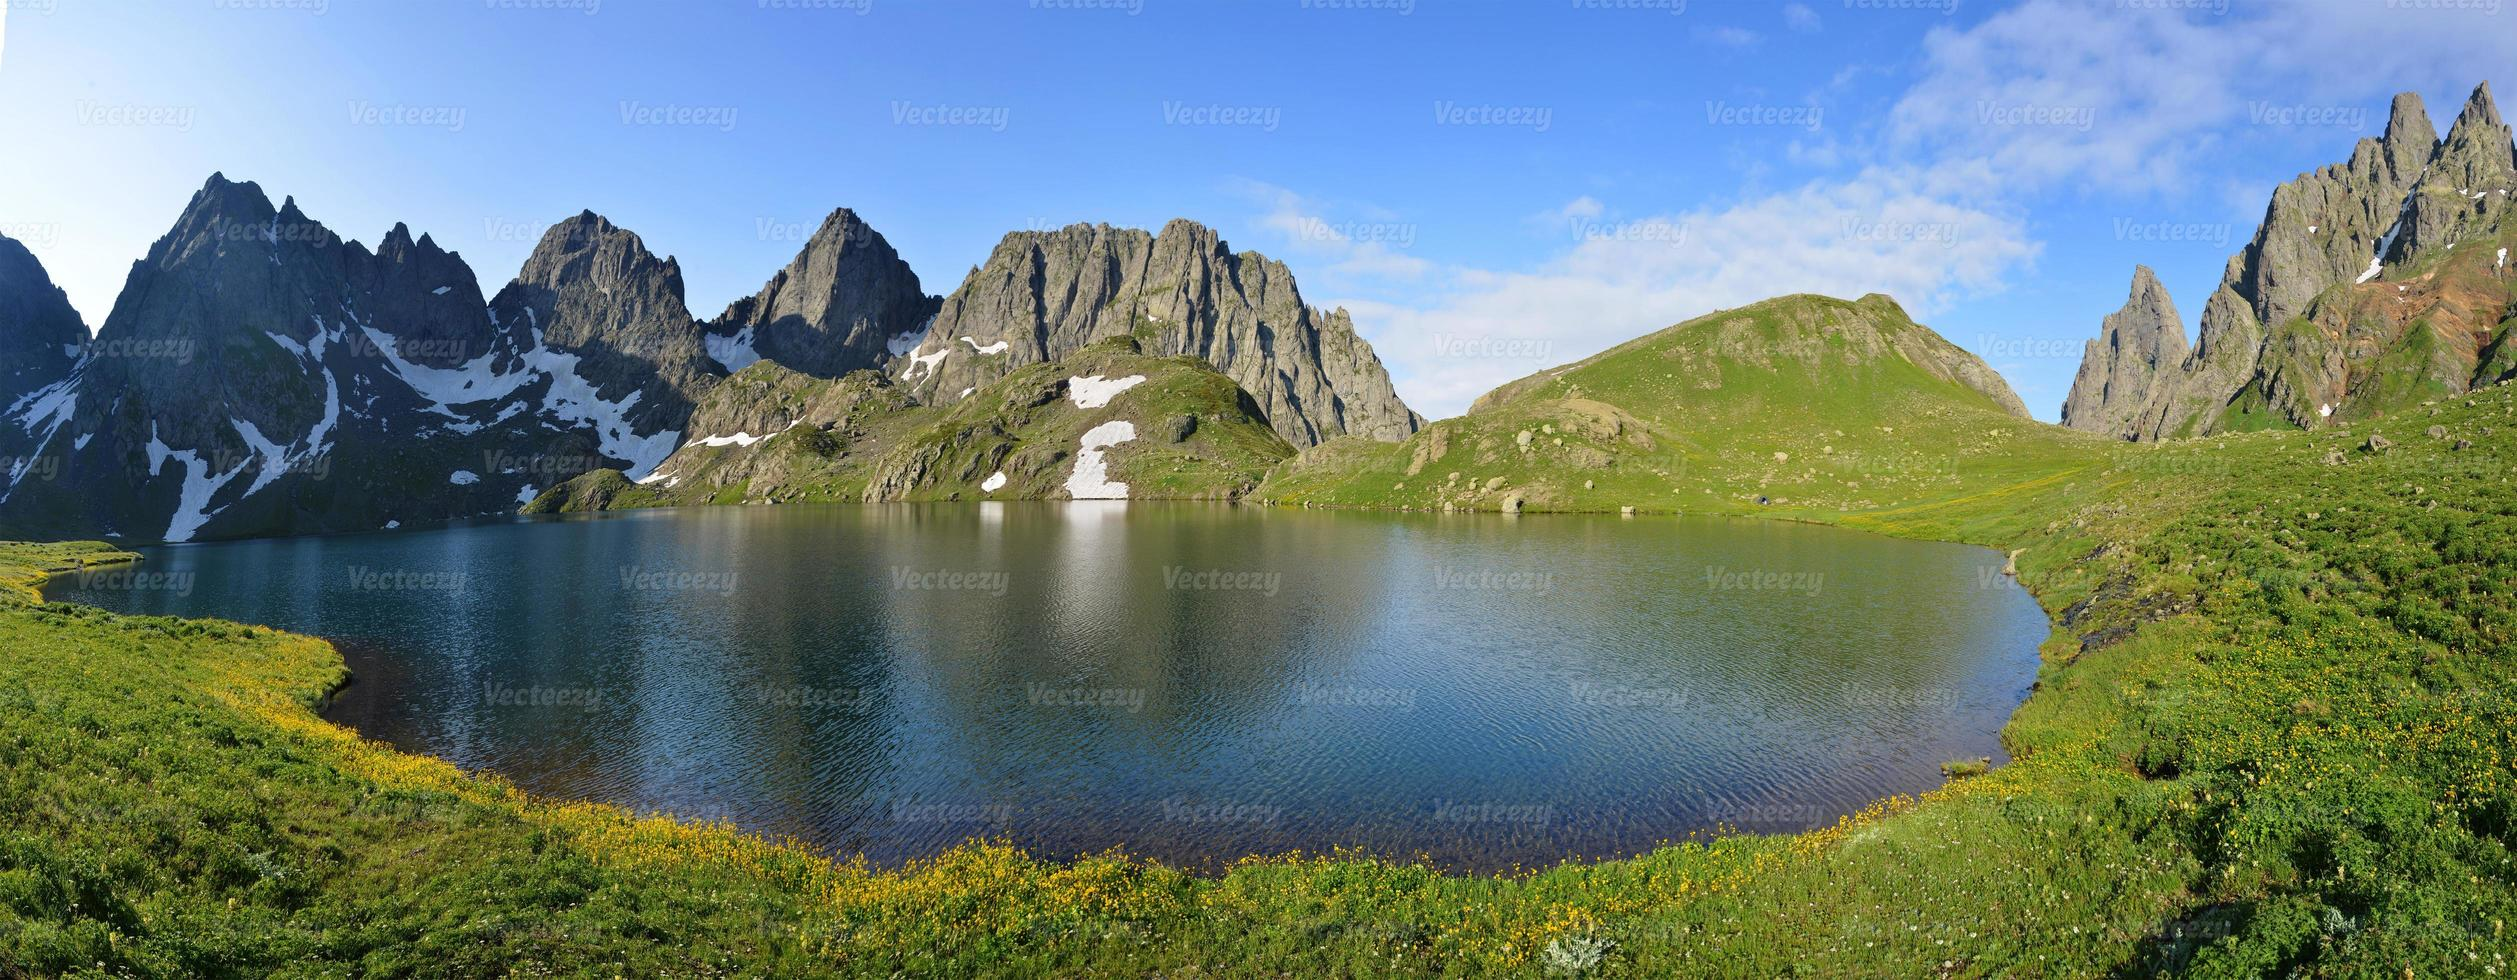 lago toba - geórgia foto